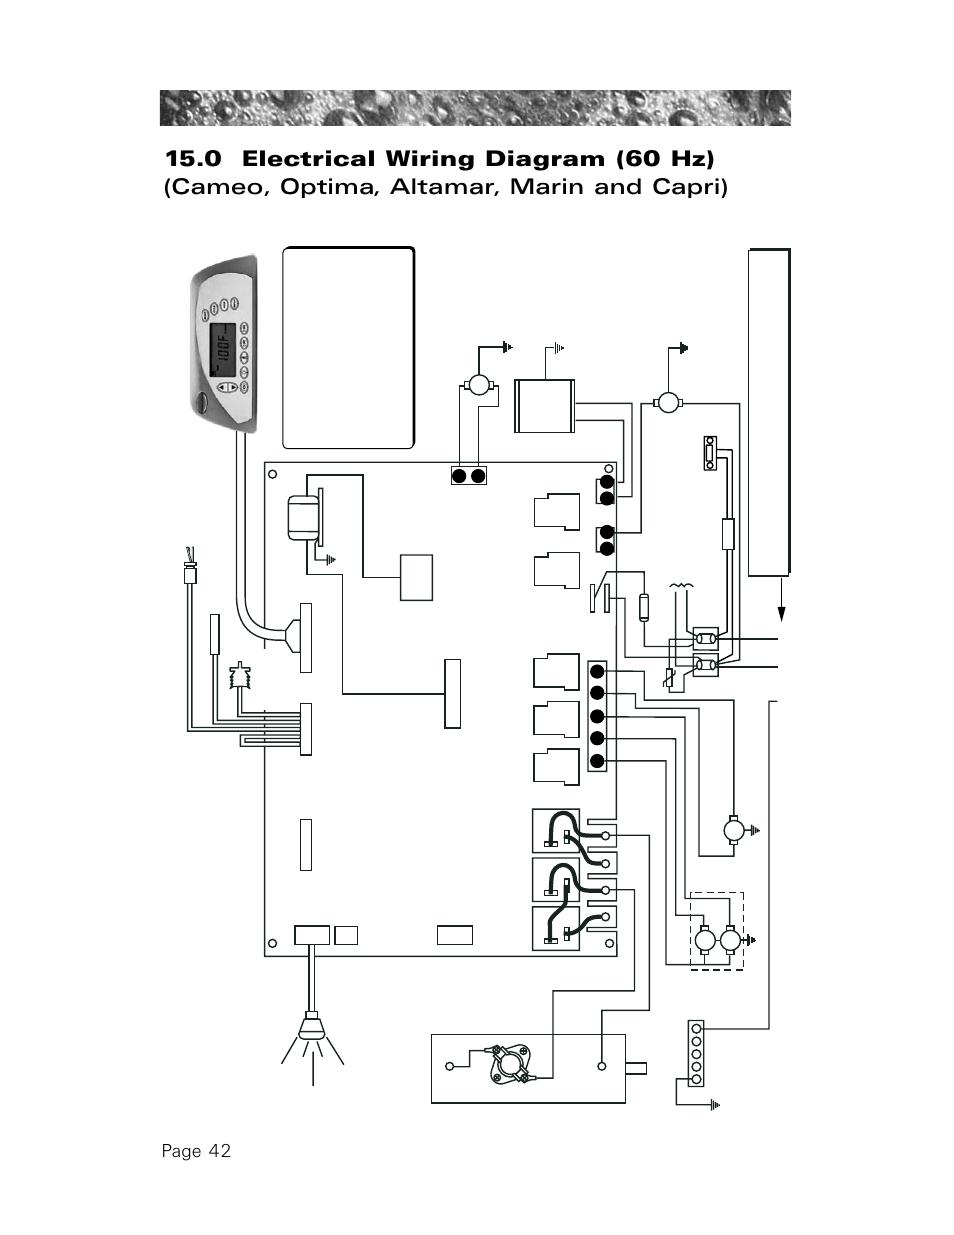 3 Phase Control Transformer Wiring Diagram 0 Electrical Wiring Diagram 60 Hz Page 42 Sundance